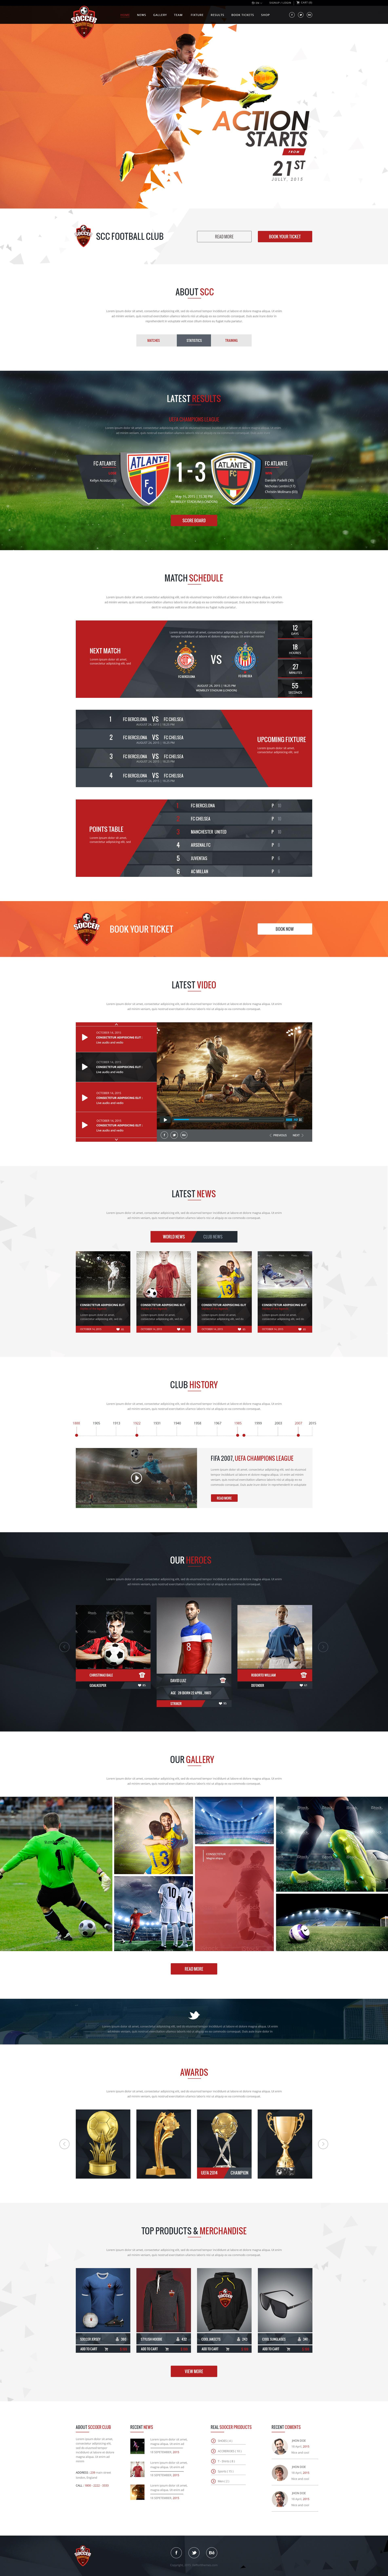 Soccer Club | Multipurpose PSD Template | web fútbol | Pinterest ...